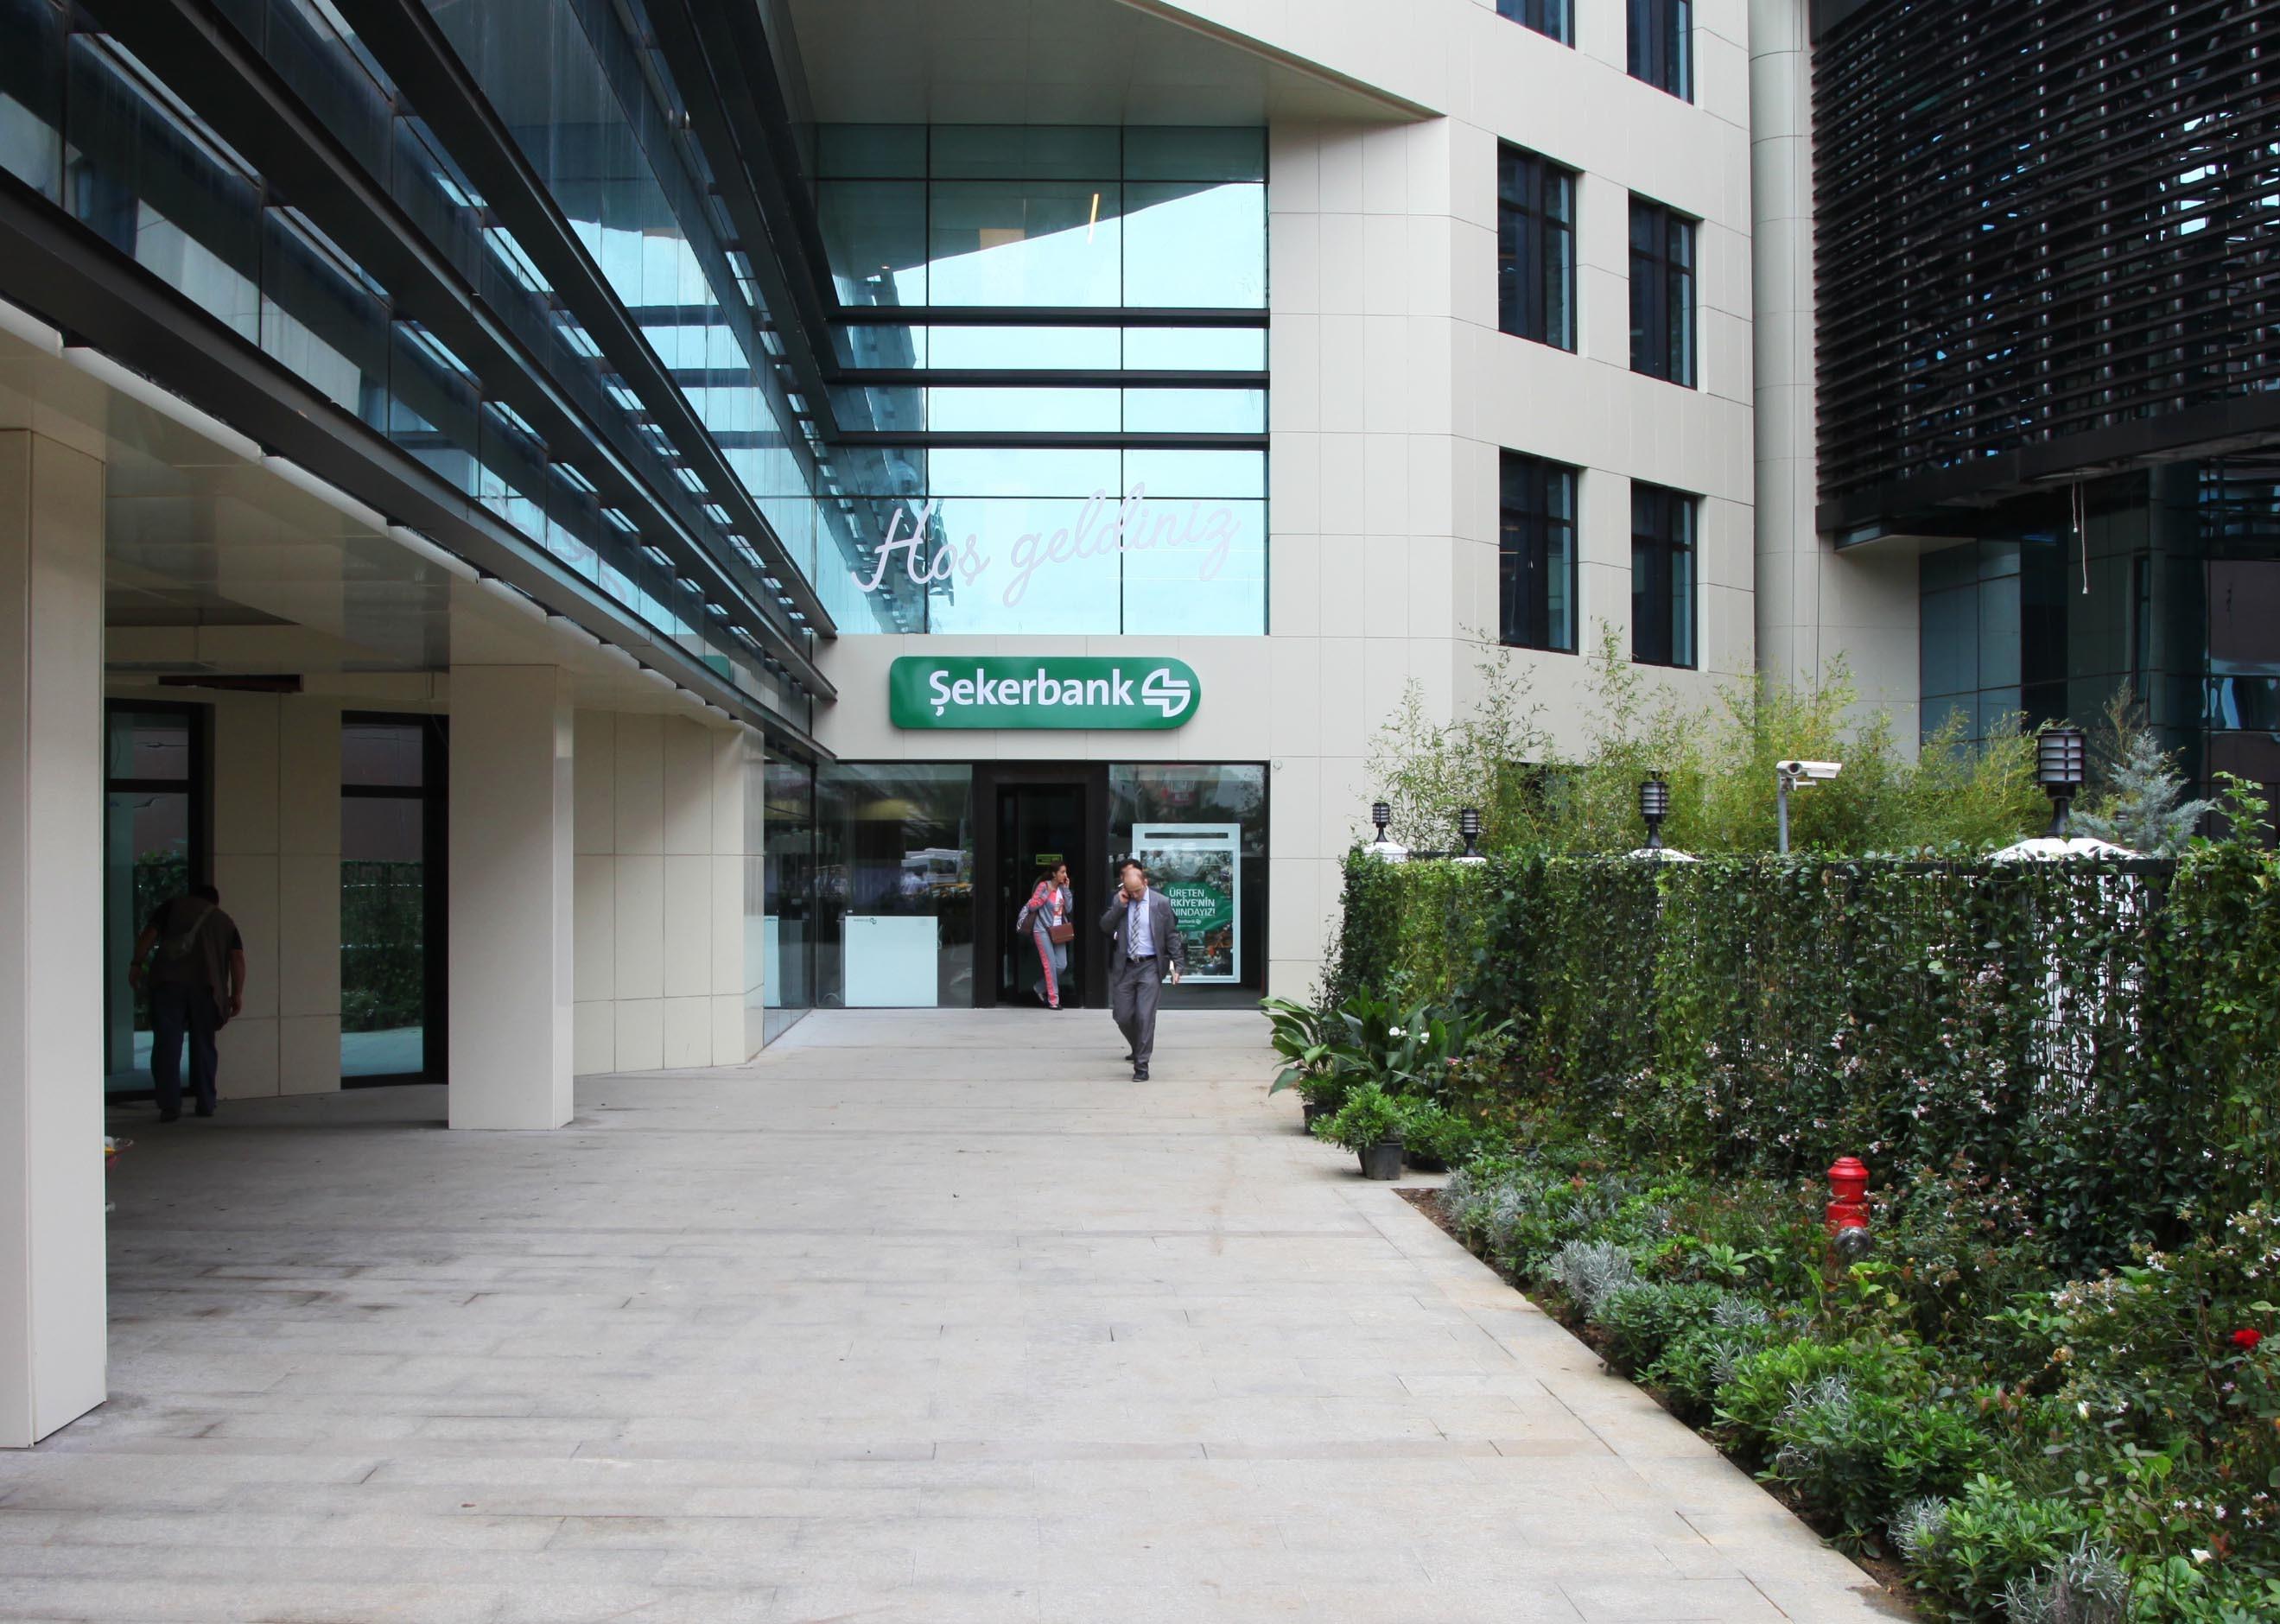 Sekerbank - Turkey - دفترمرکزی